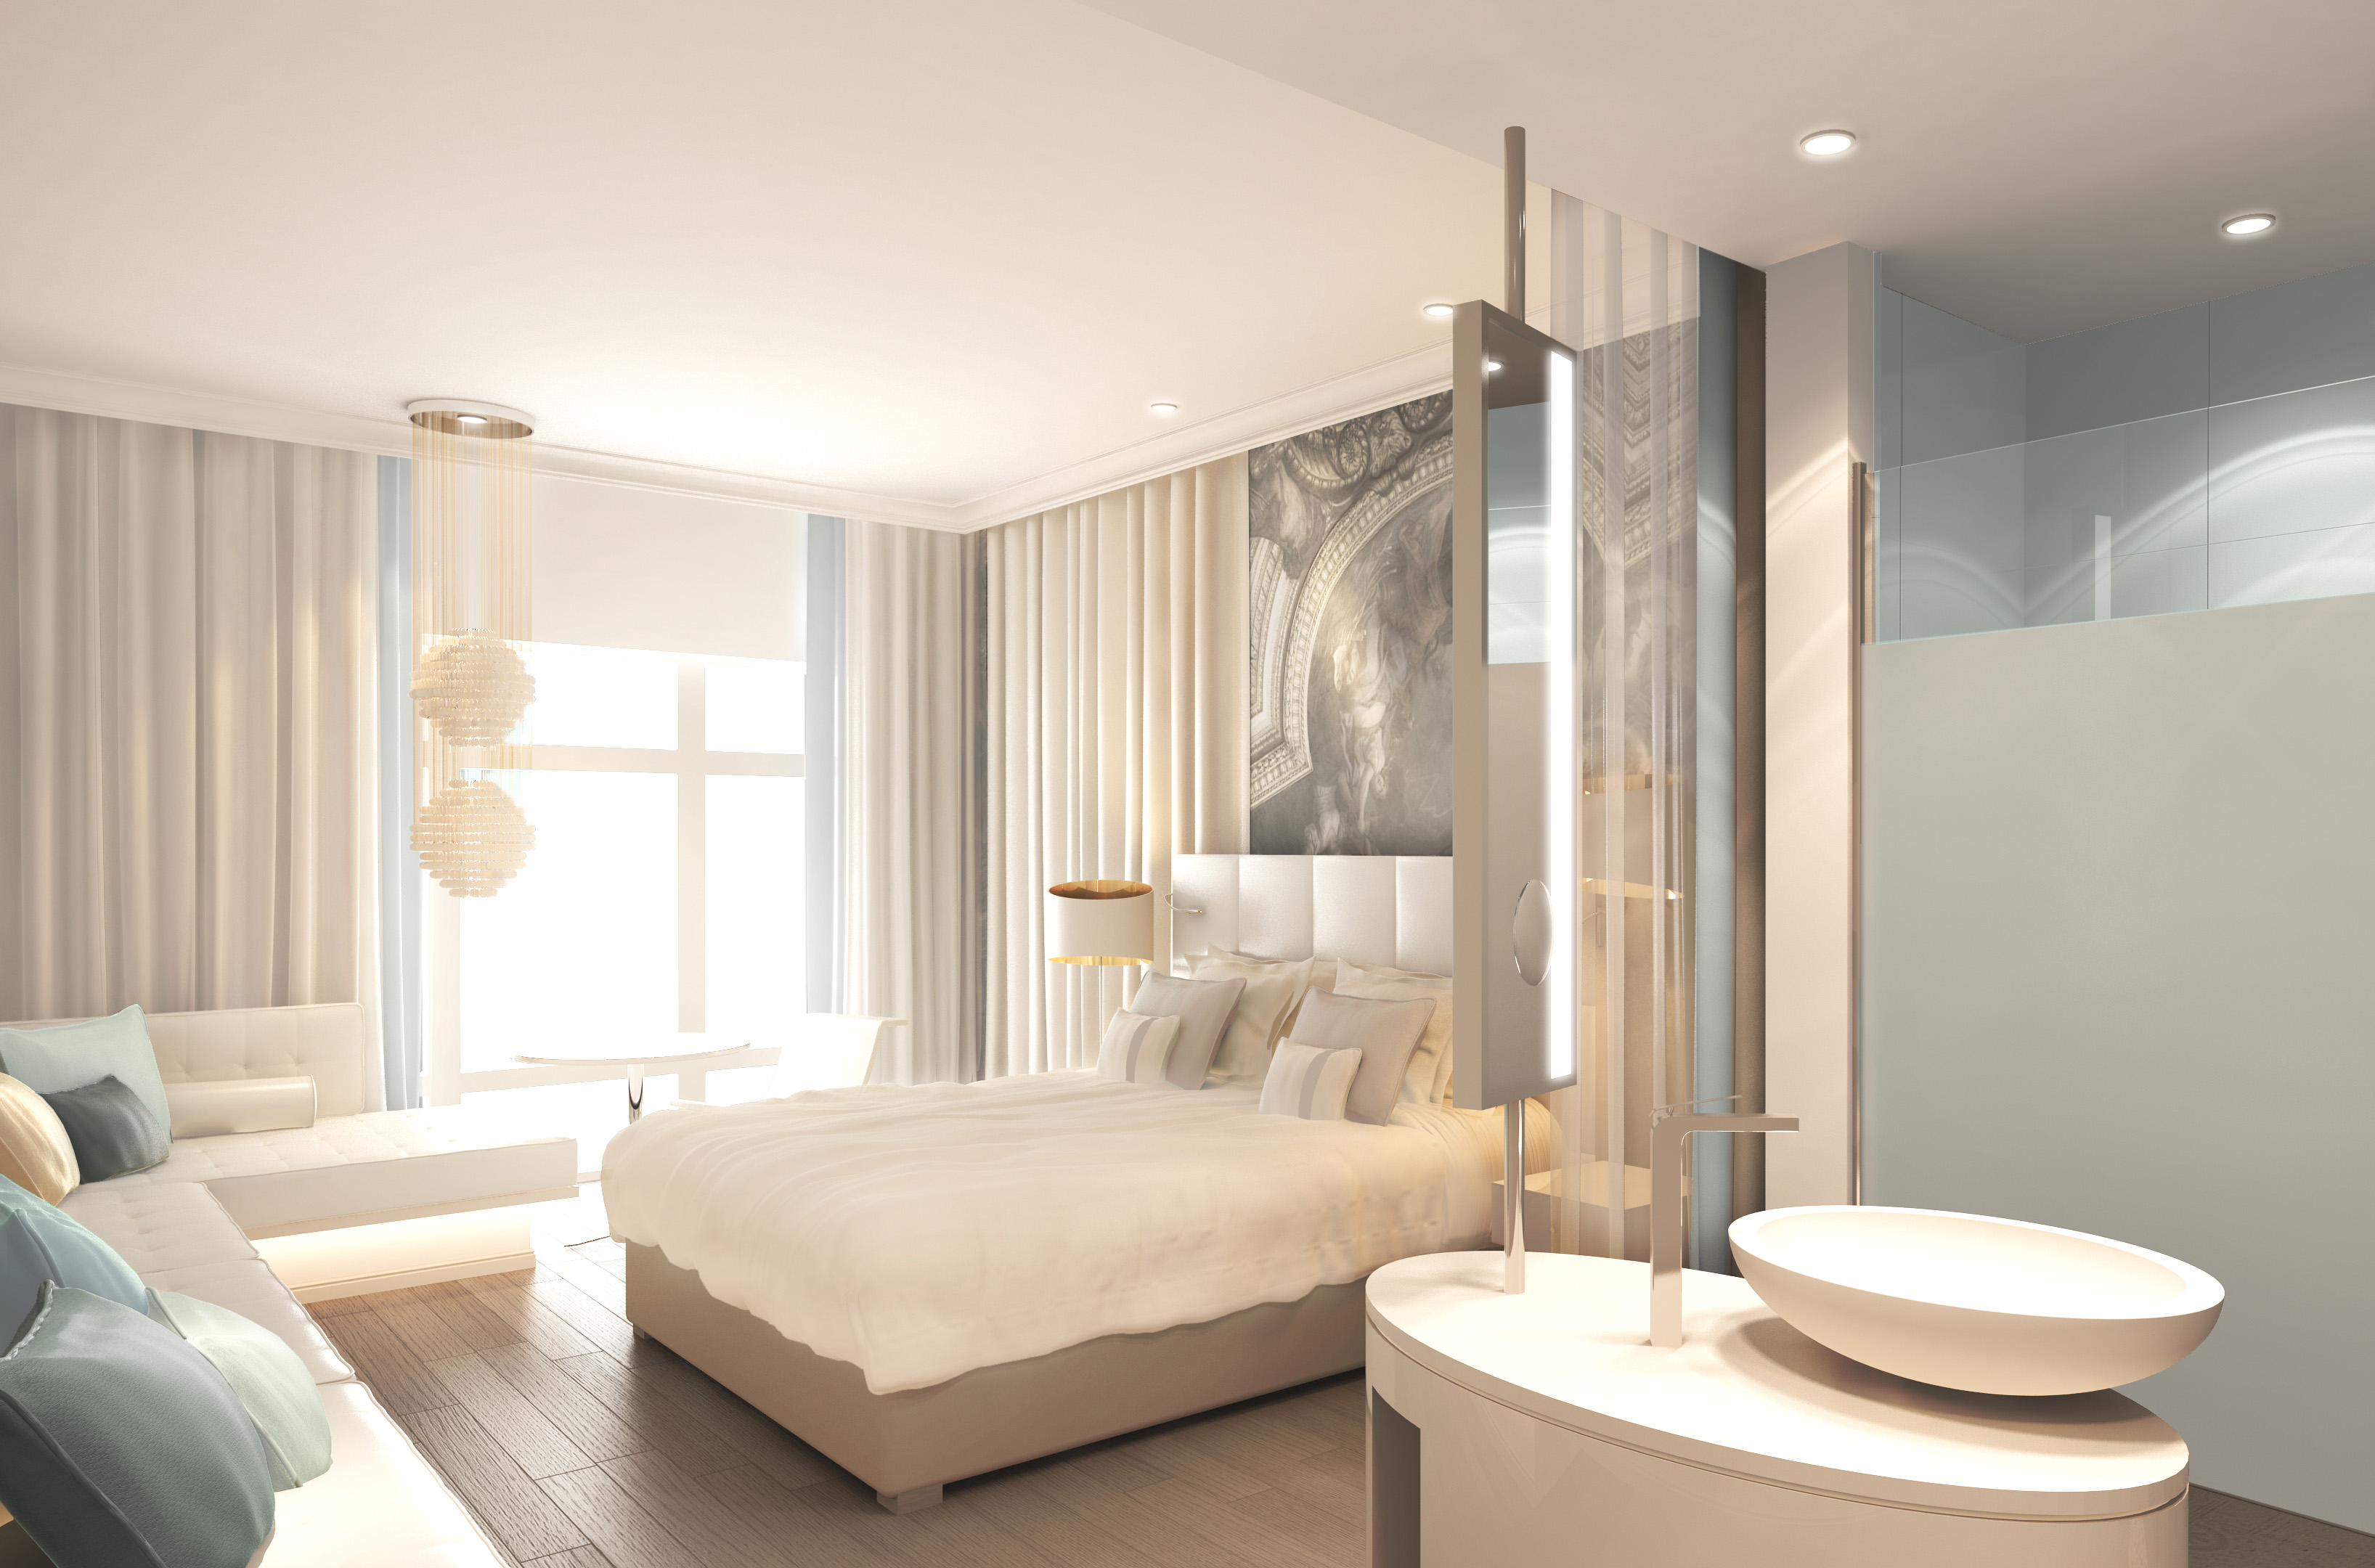 Hotel des cures marines trouville normandy france uncovered - Hotel cures marines trouville ...